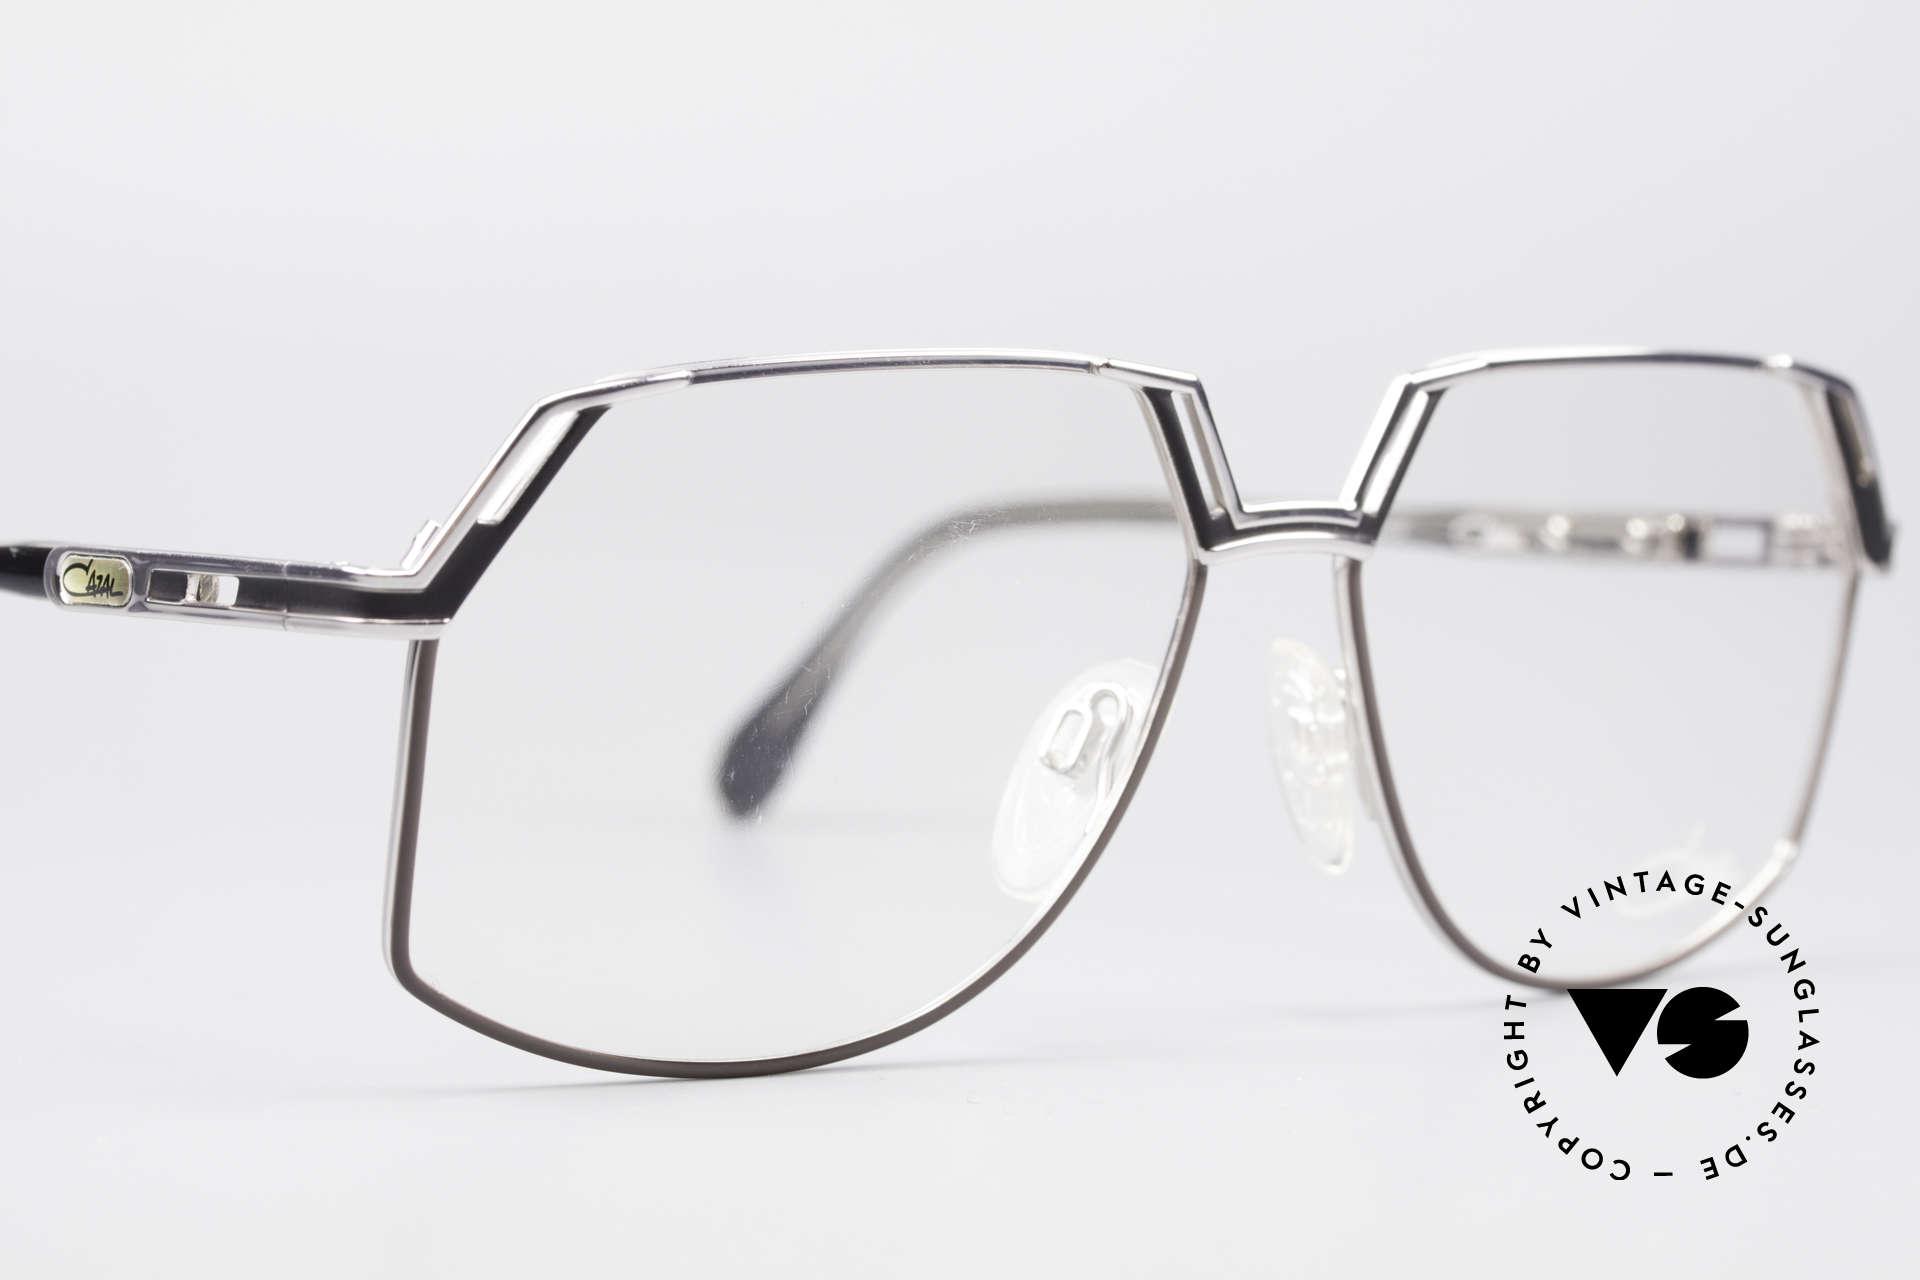 Cazal 738 True Vintage Eyeglasses, the frame is made for lenses of any kind (optical / sun), Made for Men